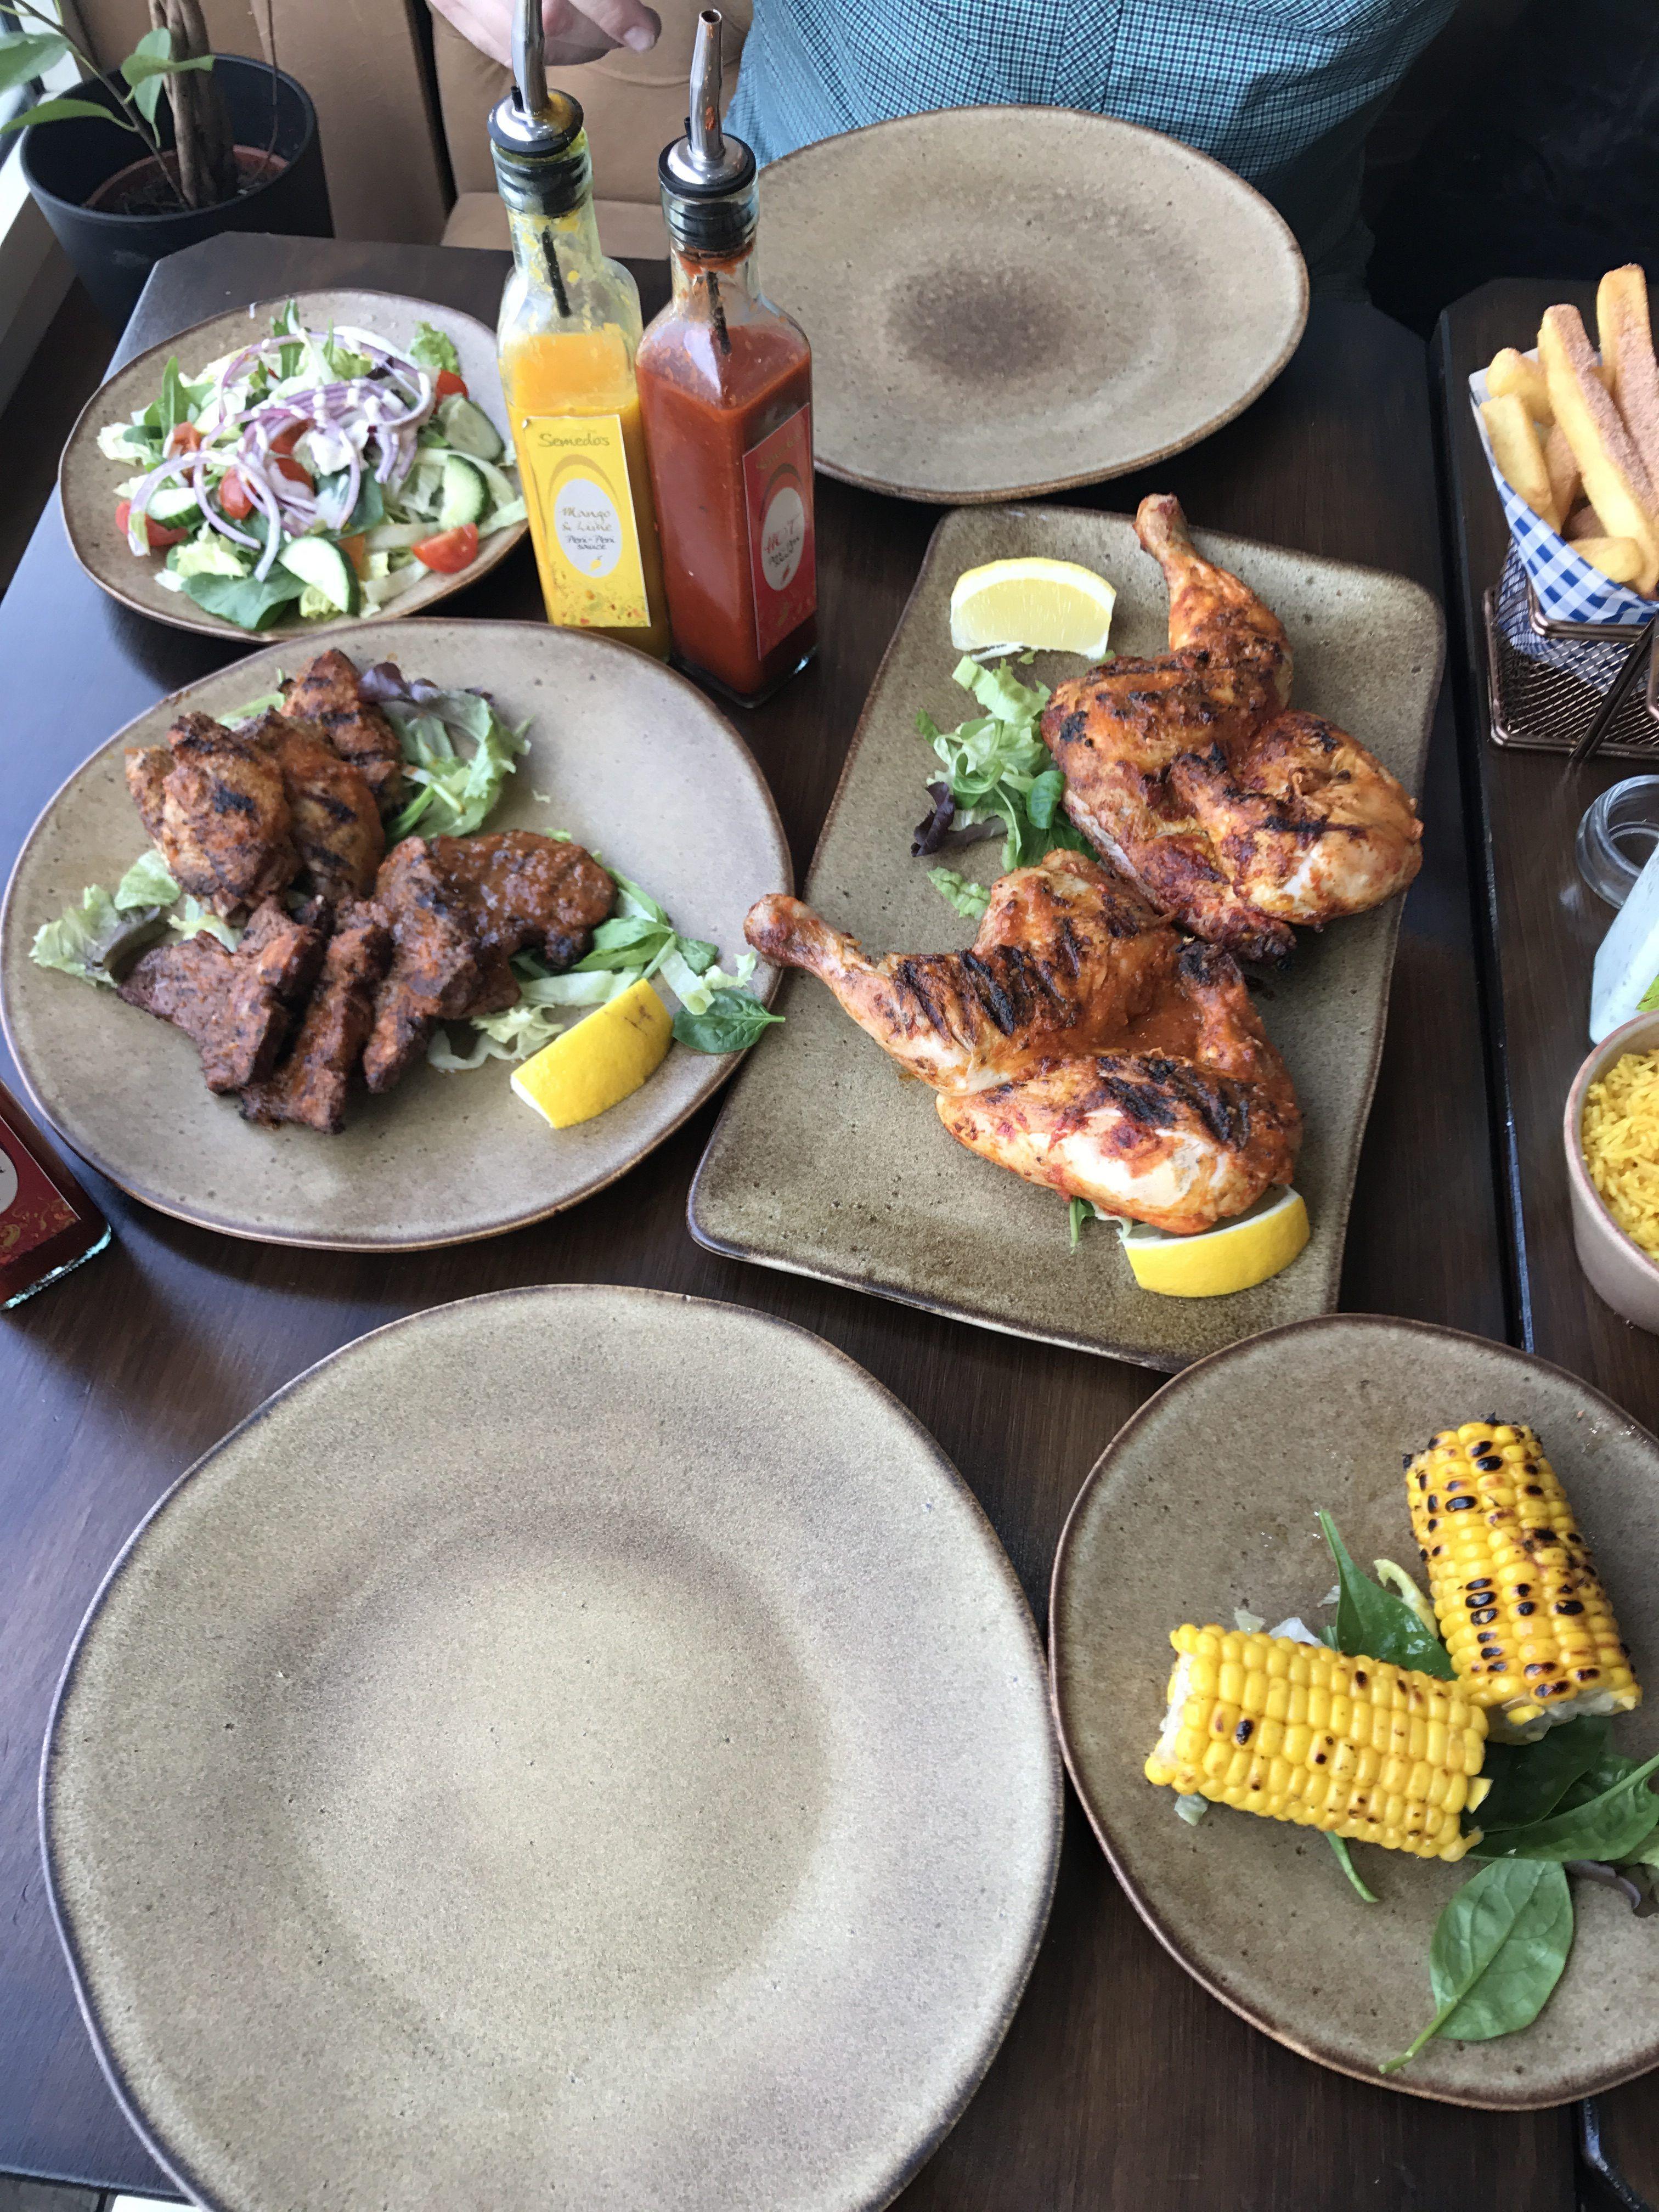 Semedos Birmingham Review Hmc Certified Halal Recipes Food Gastronomy